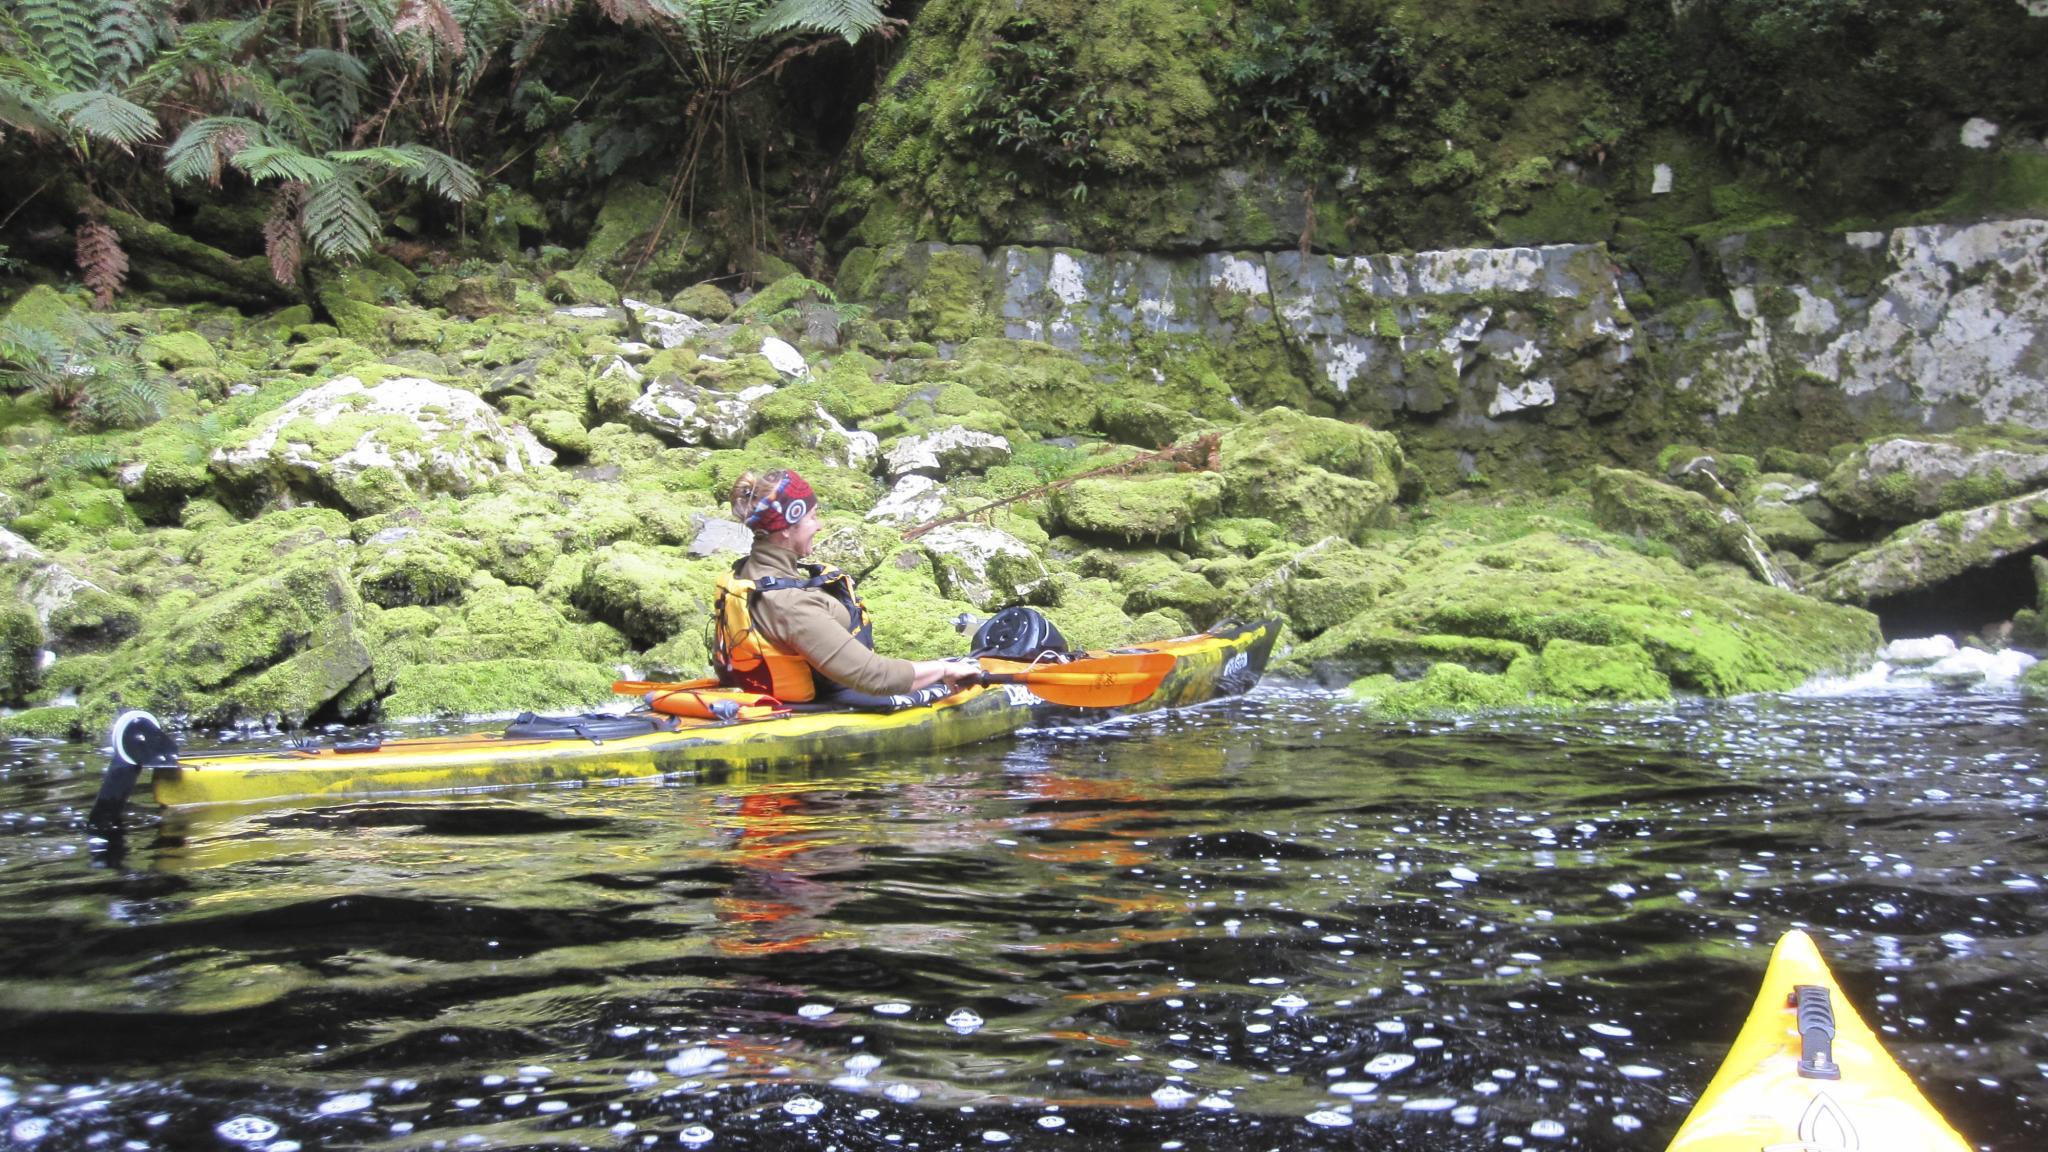 Multi day wilderness kayaking adventures on the Gordon River